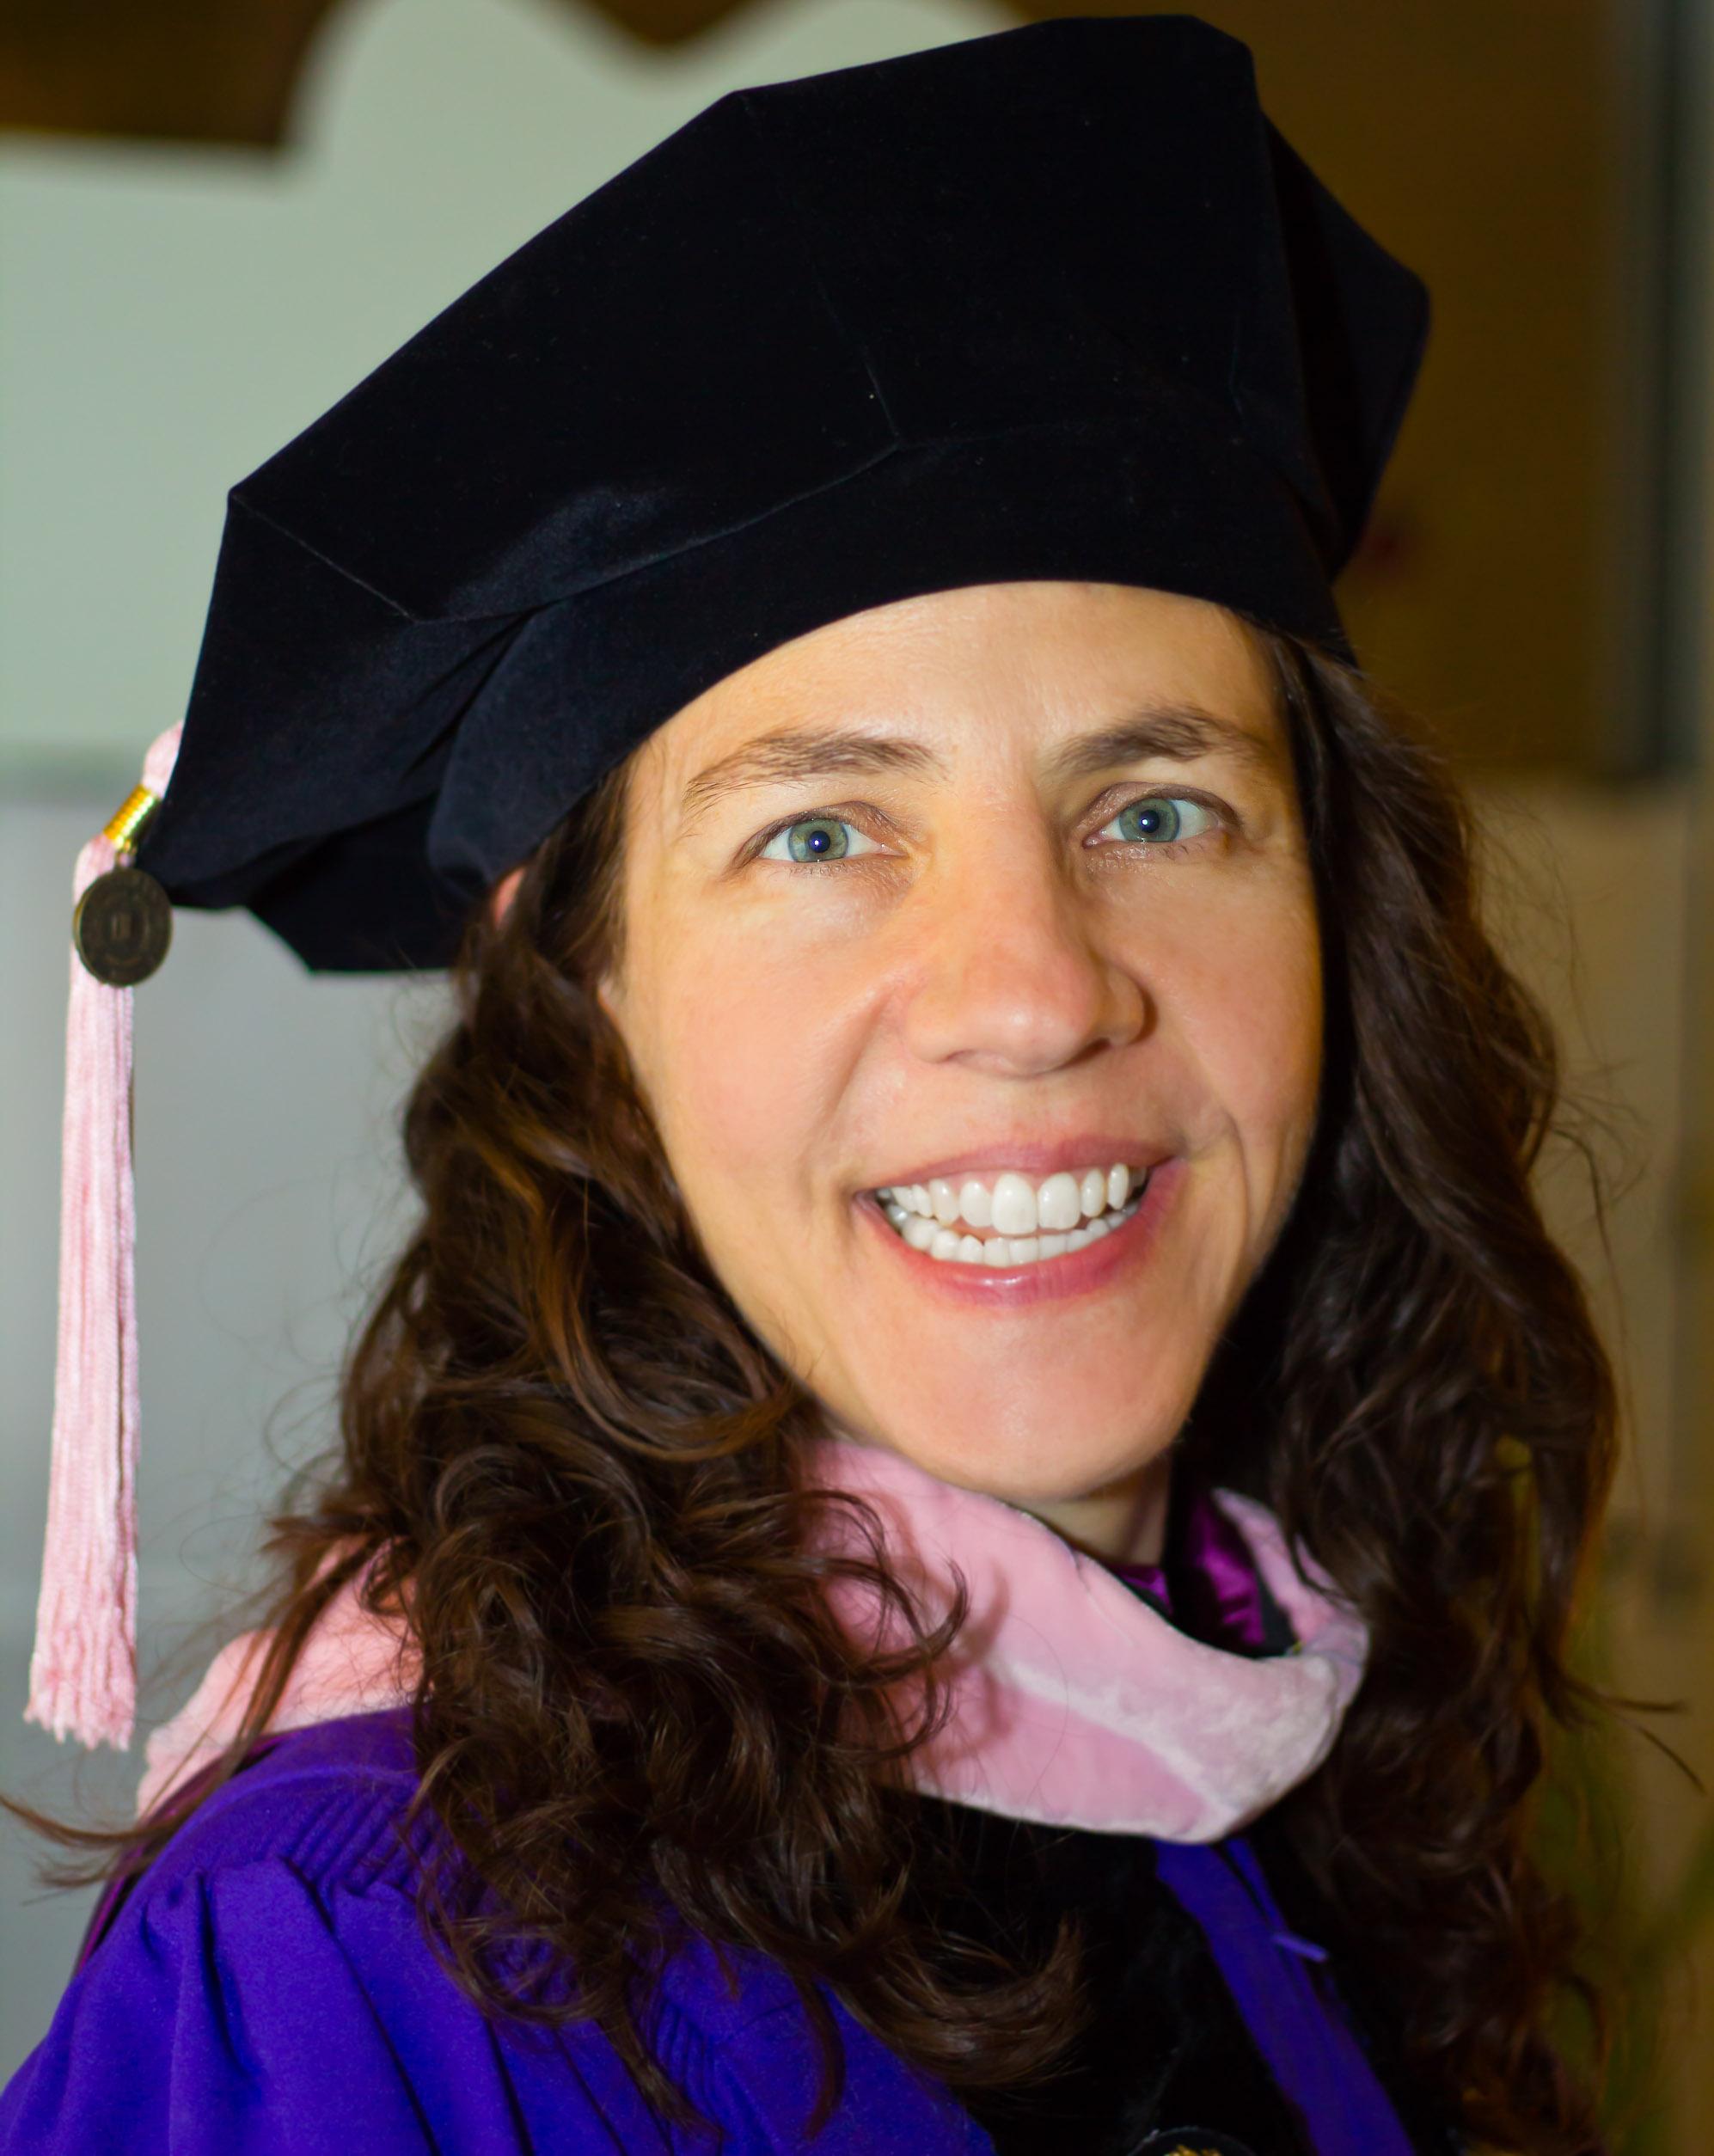 Dr. Jennifer Anne Ohlson Trowbridge graduating fromNorthwestern University